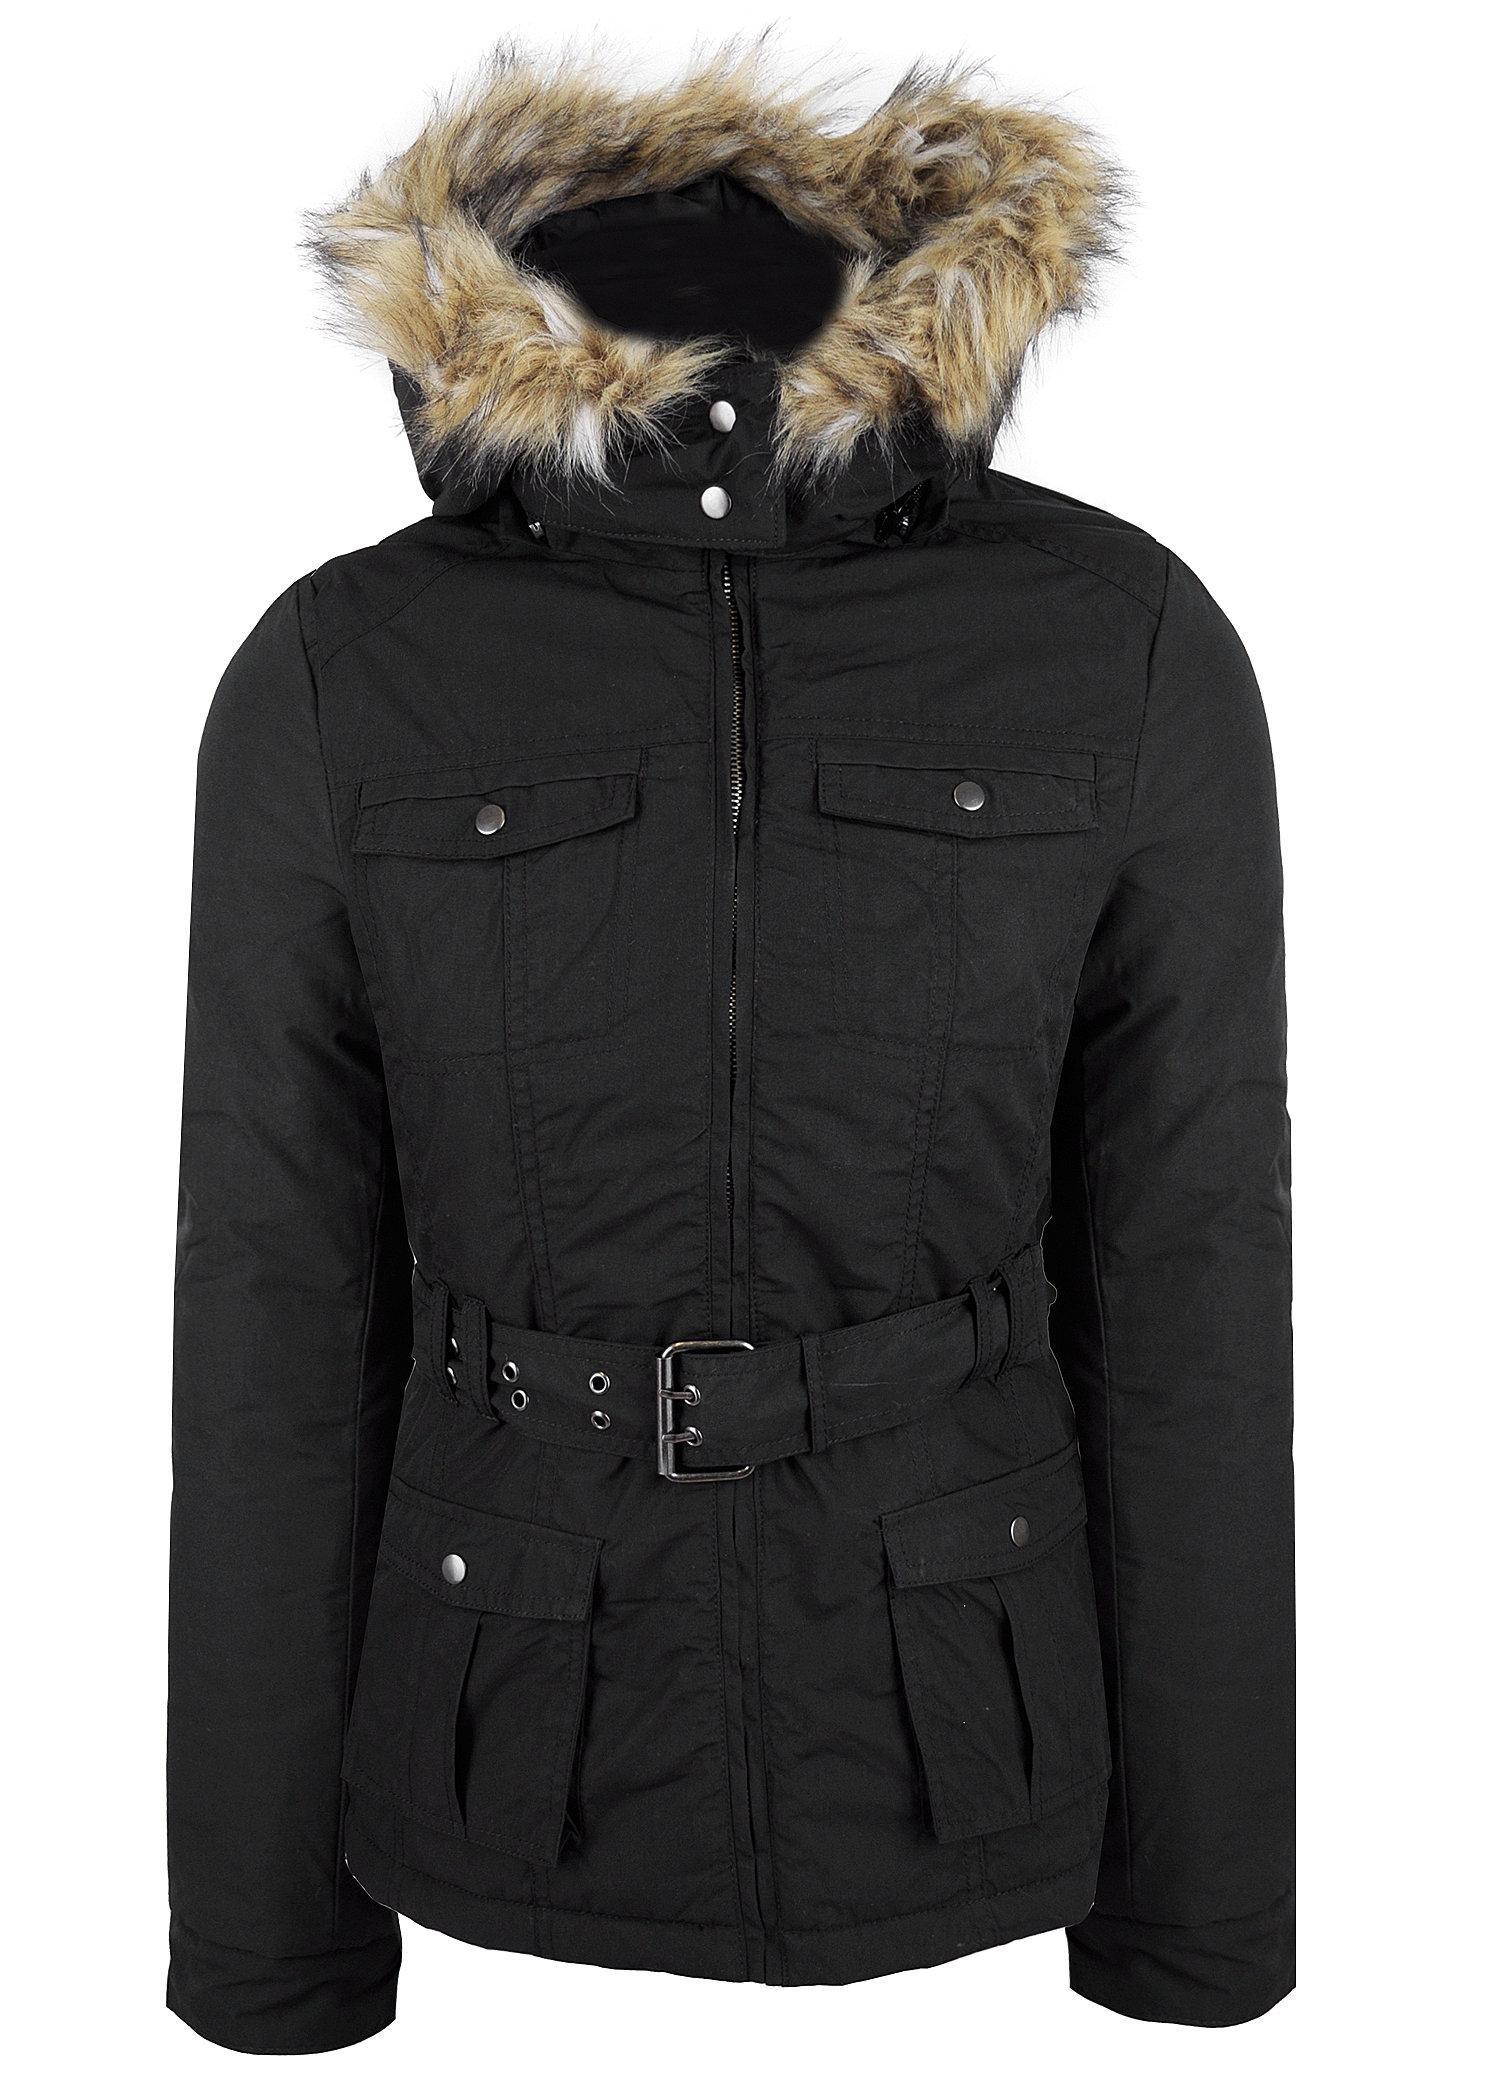 madonna fashion winterjacke fellkapuze g rtel schwarz. Black Bedroom Furniture Sets. Home Design Ideas